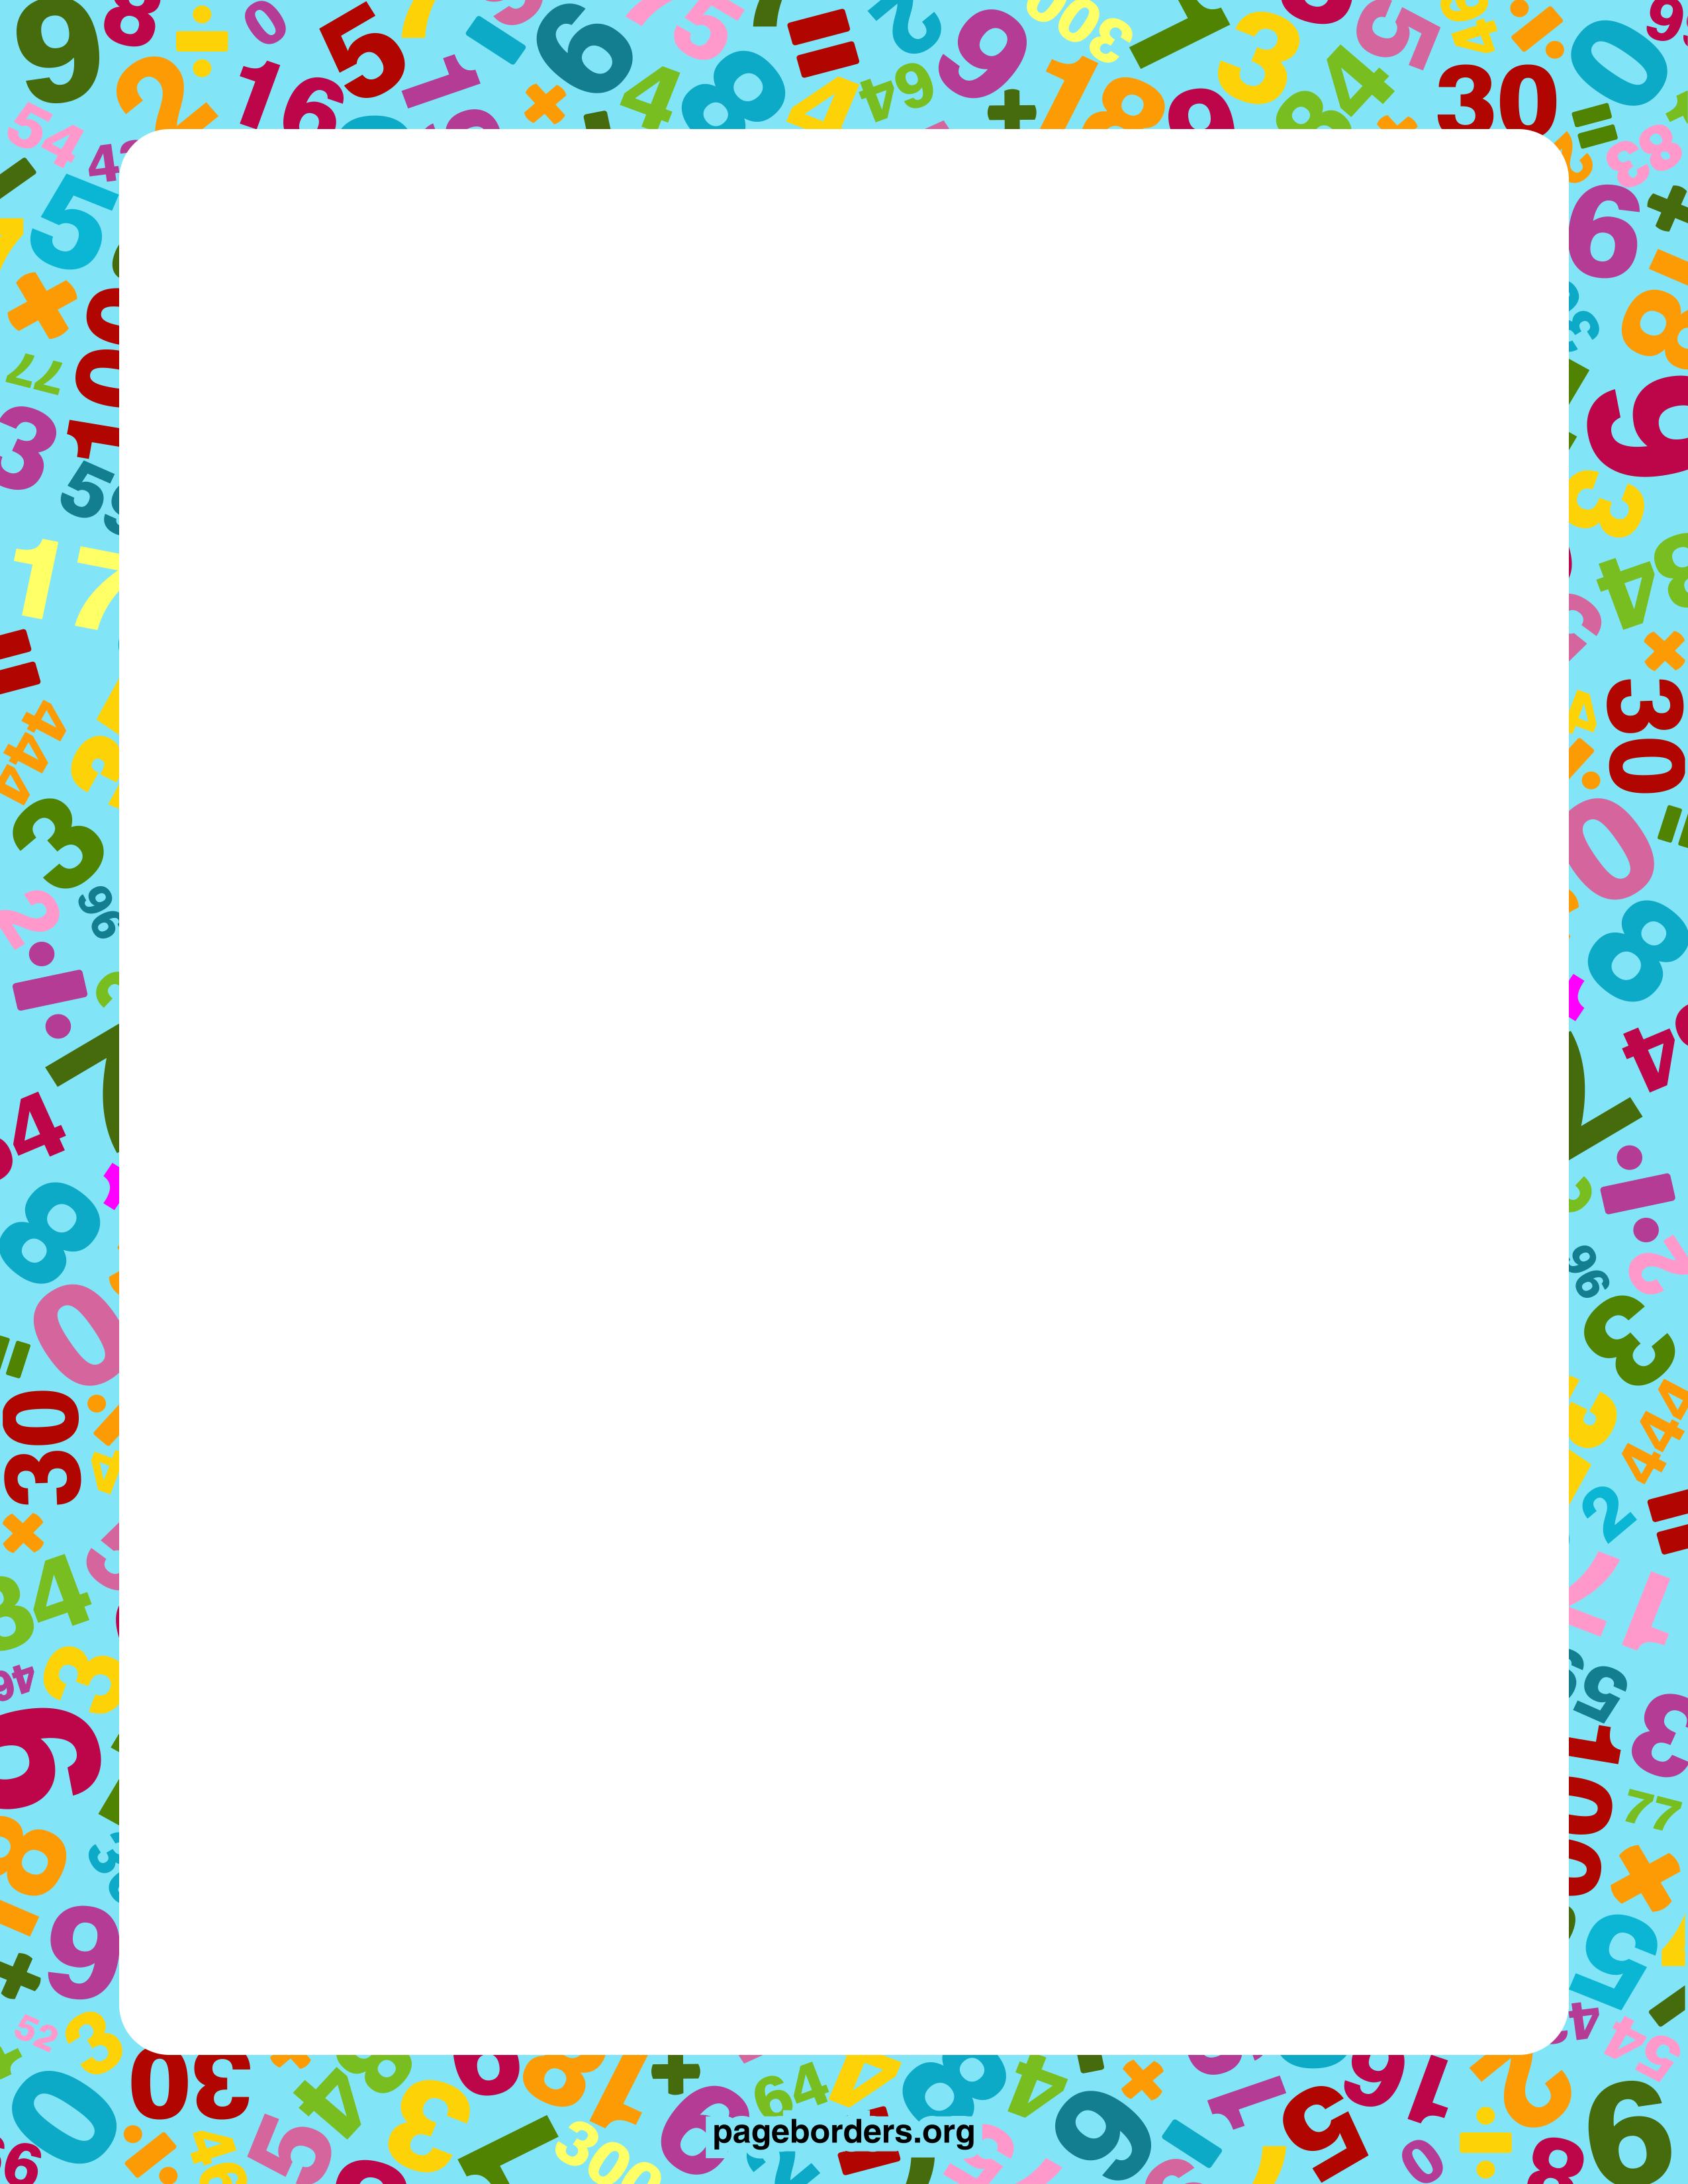 5th grade math border clipart svg free download Math Page Borders - Cliparts.co svg free download